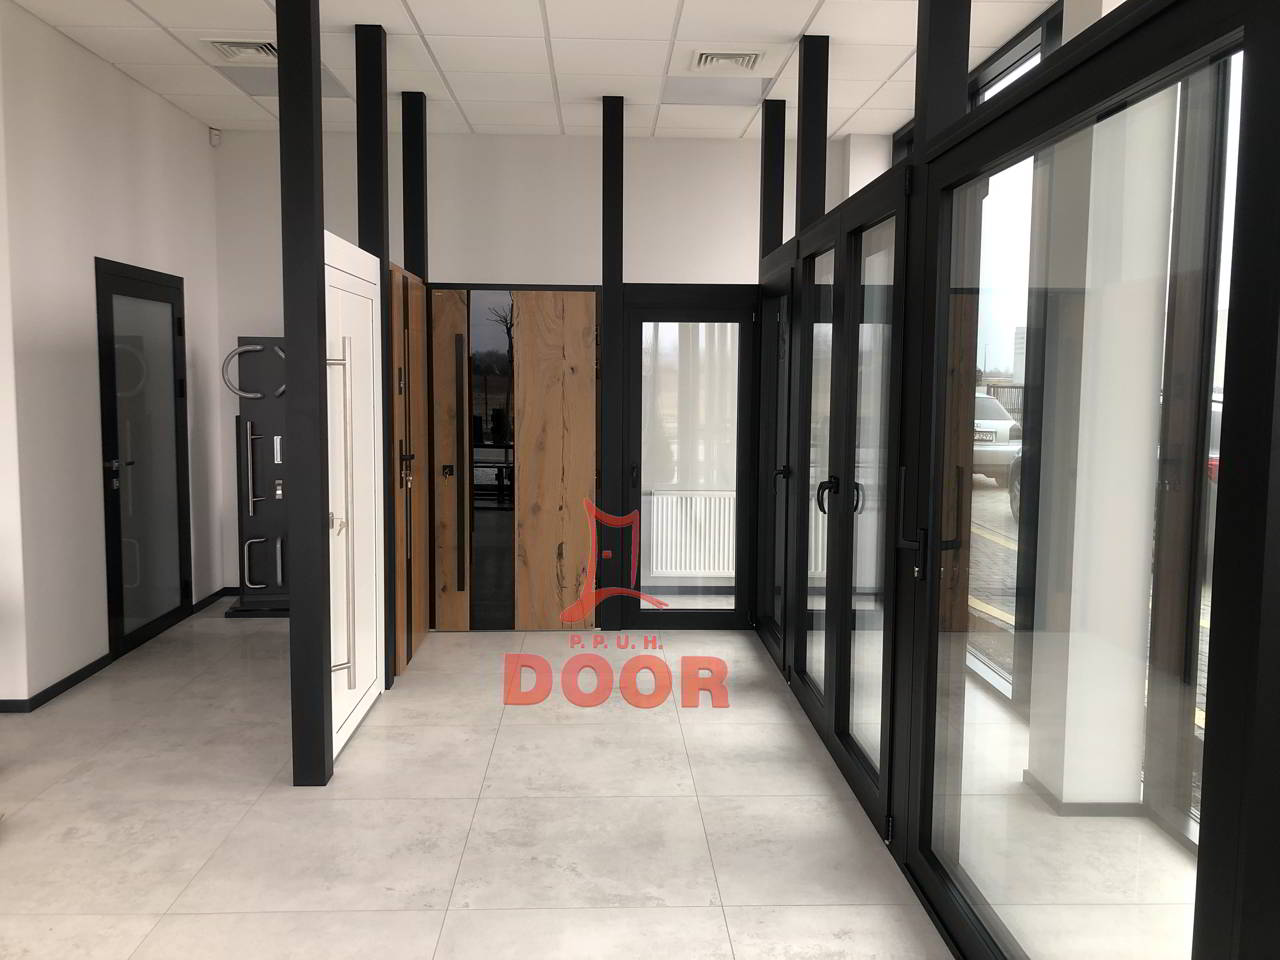 Salon z produktami DOOR